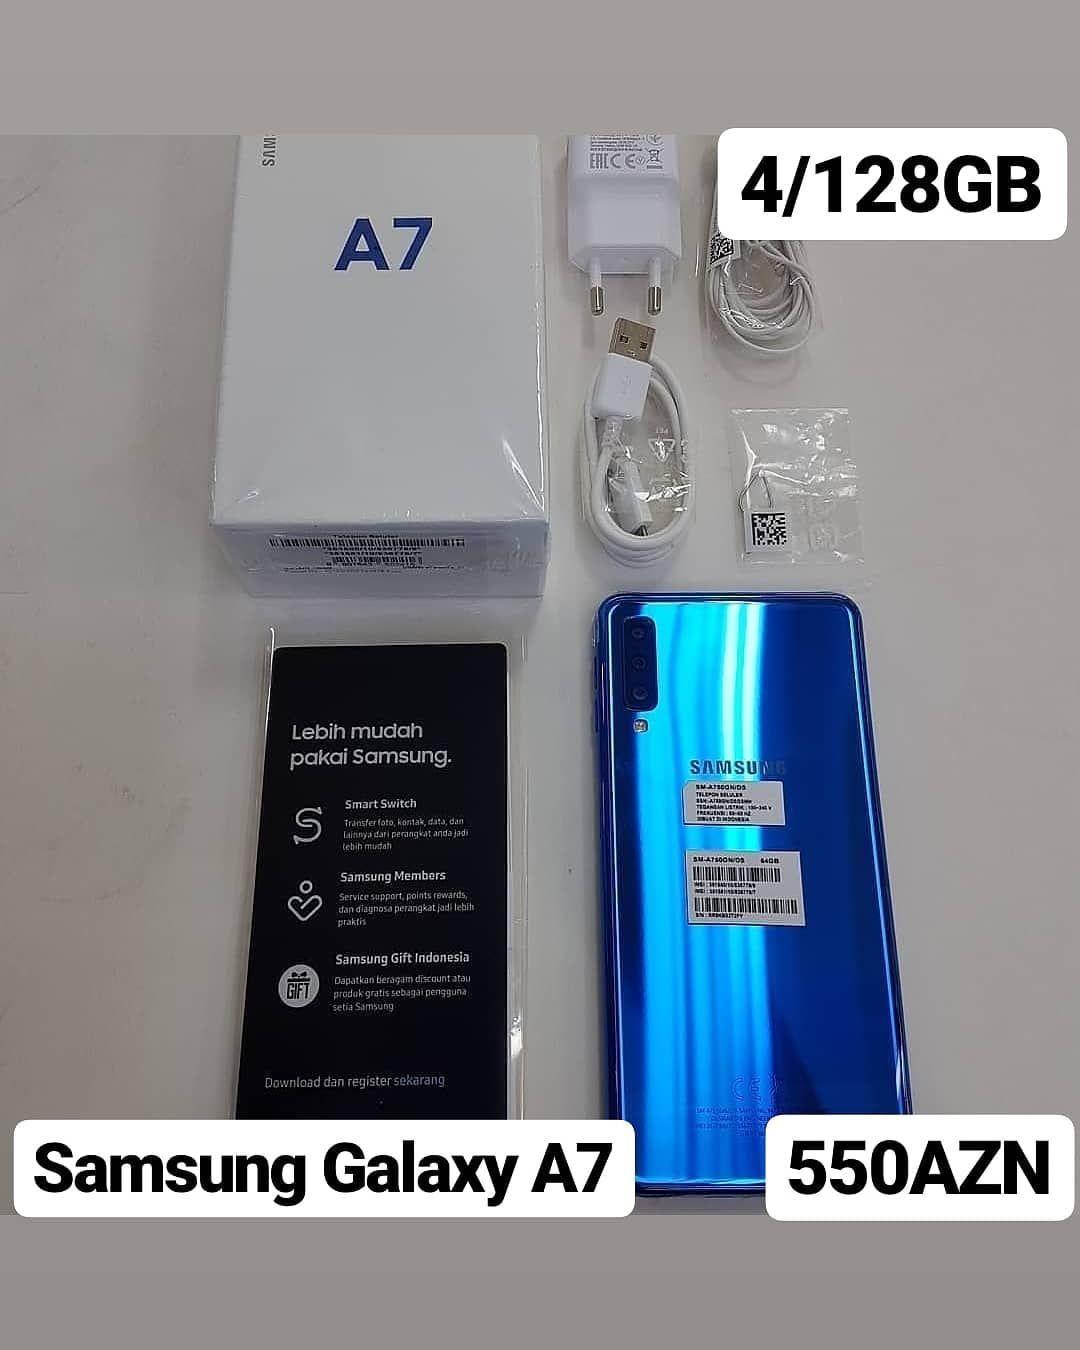 Samsung Galaxy A7ekran 6 0 Inch 1080x2020hd Pixel 411 Ppi Super Amoled Multi Touchram4gbrom128gbarxa Kamera24mp8mp5mpf1 Instagram Posts Instagram Cool Pictures